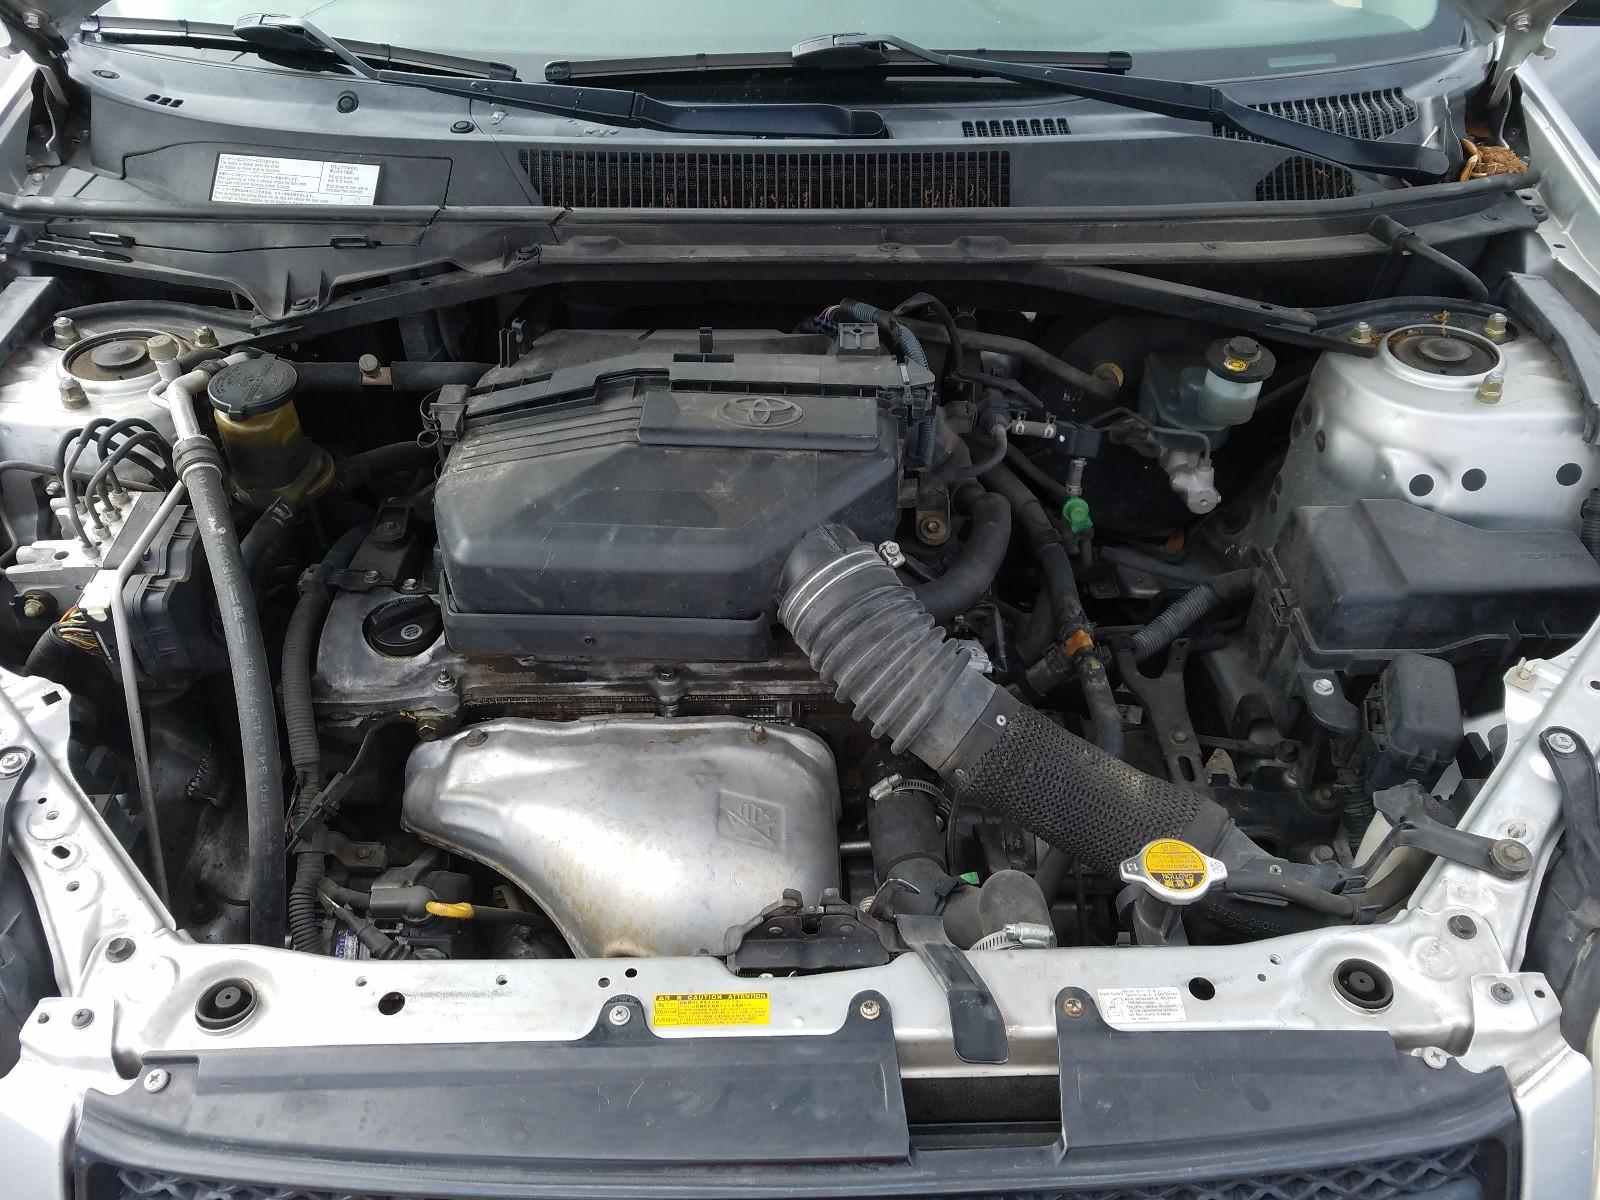 JTEGD20V740042385 - 2004 Toyota Rav4 2.4L inside view